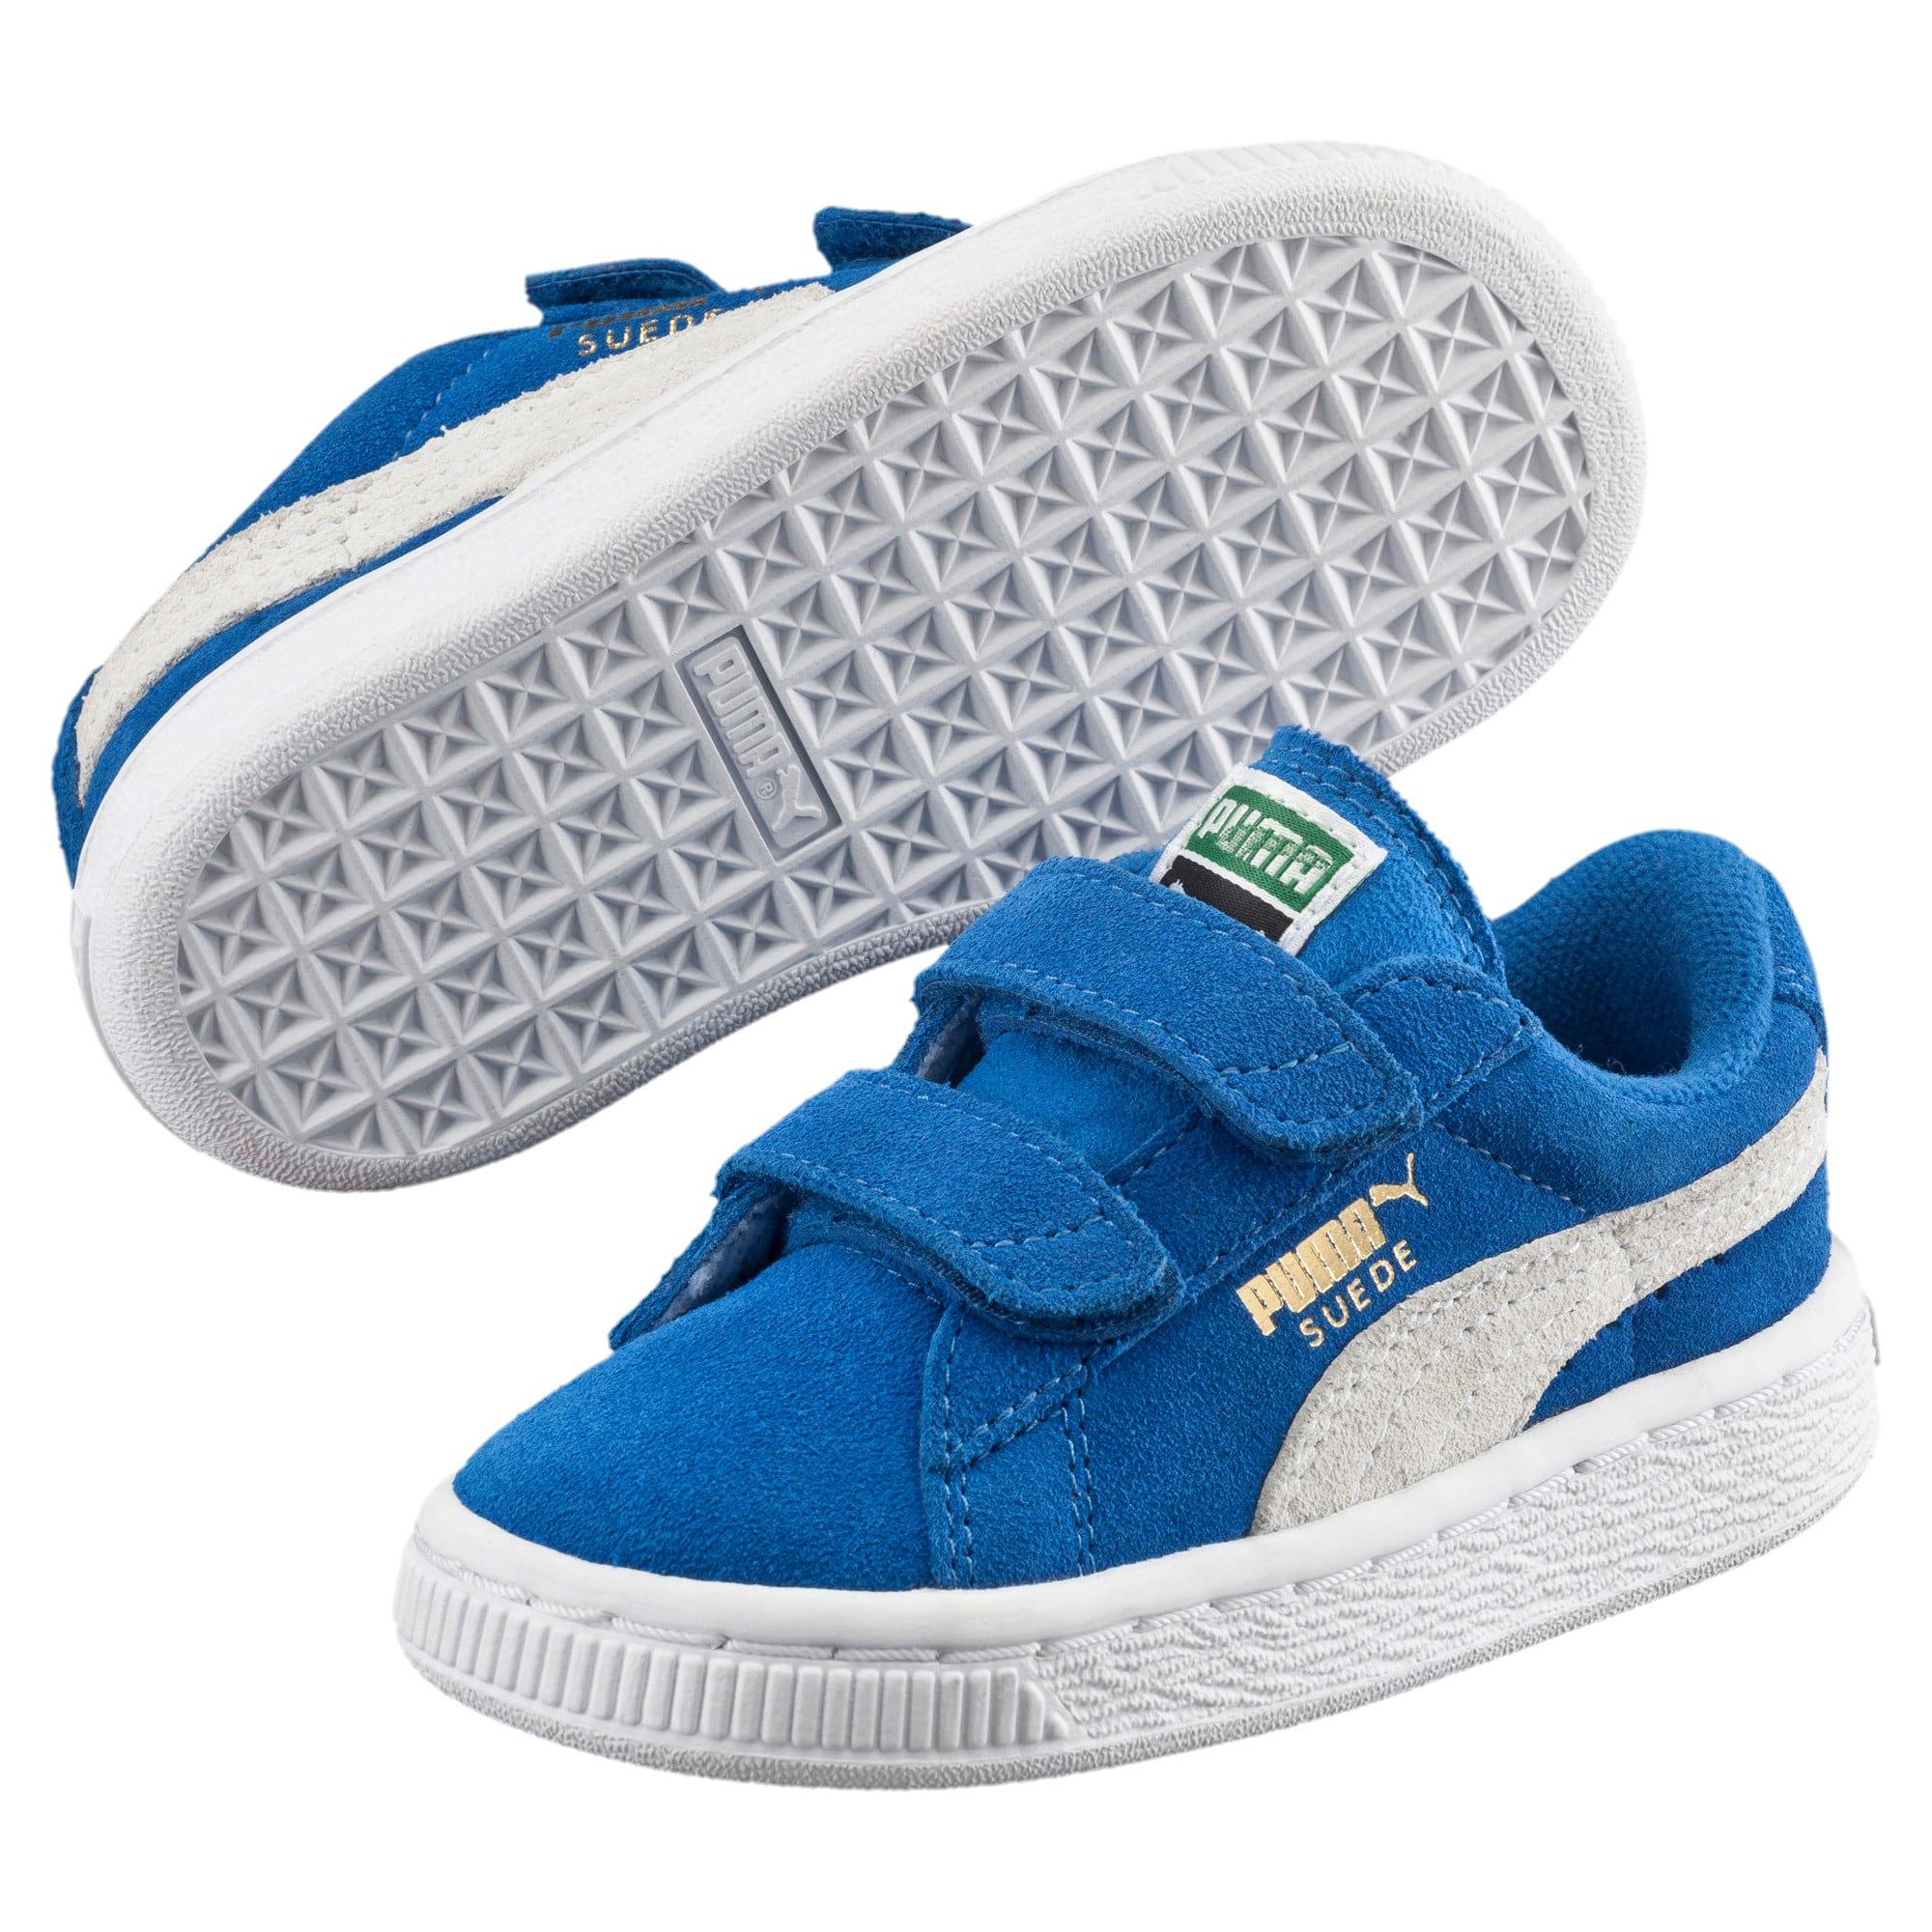 Thumbnail 2 of Suede Preschool Sneaker mit 2 Riemen, Snorkel Blue-Puma White, medium